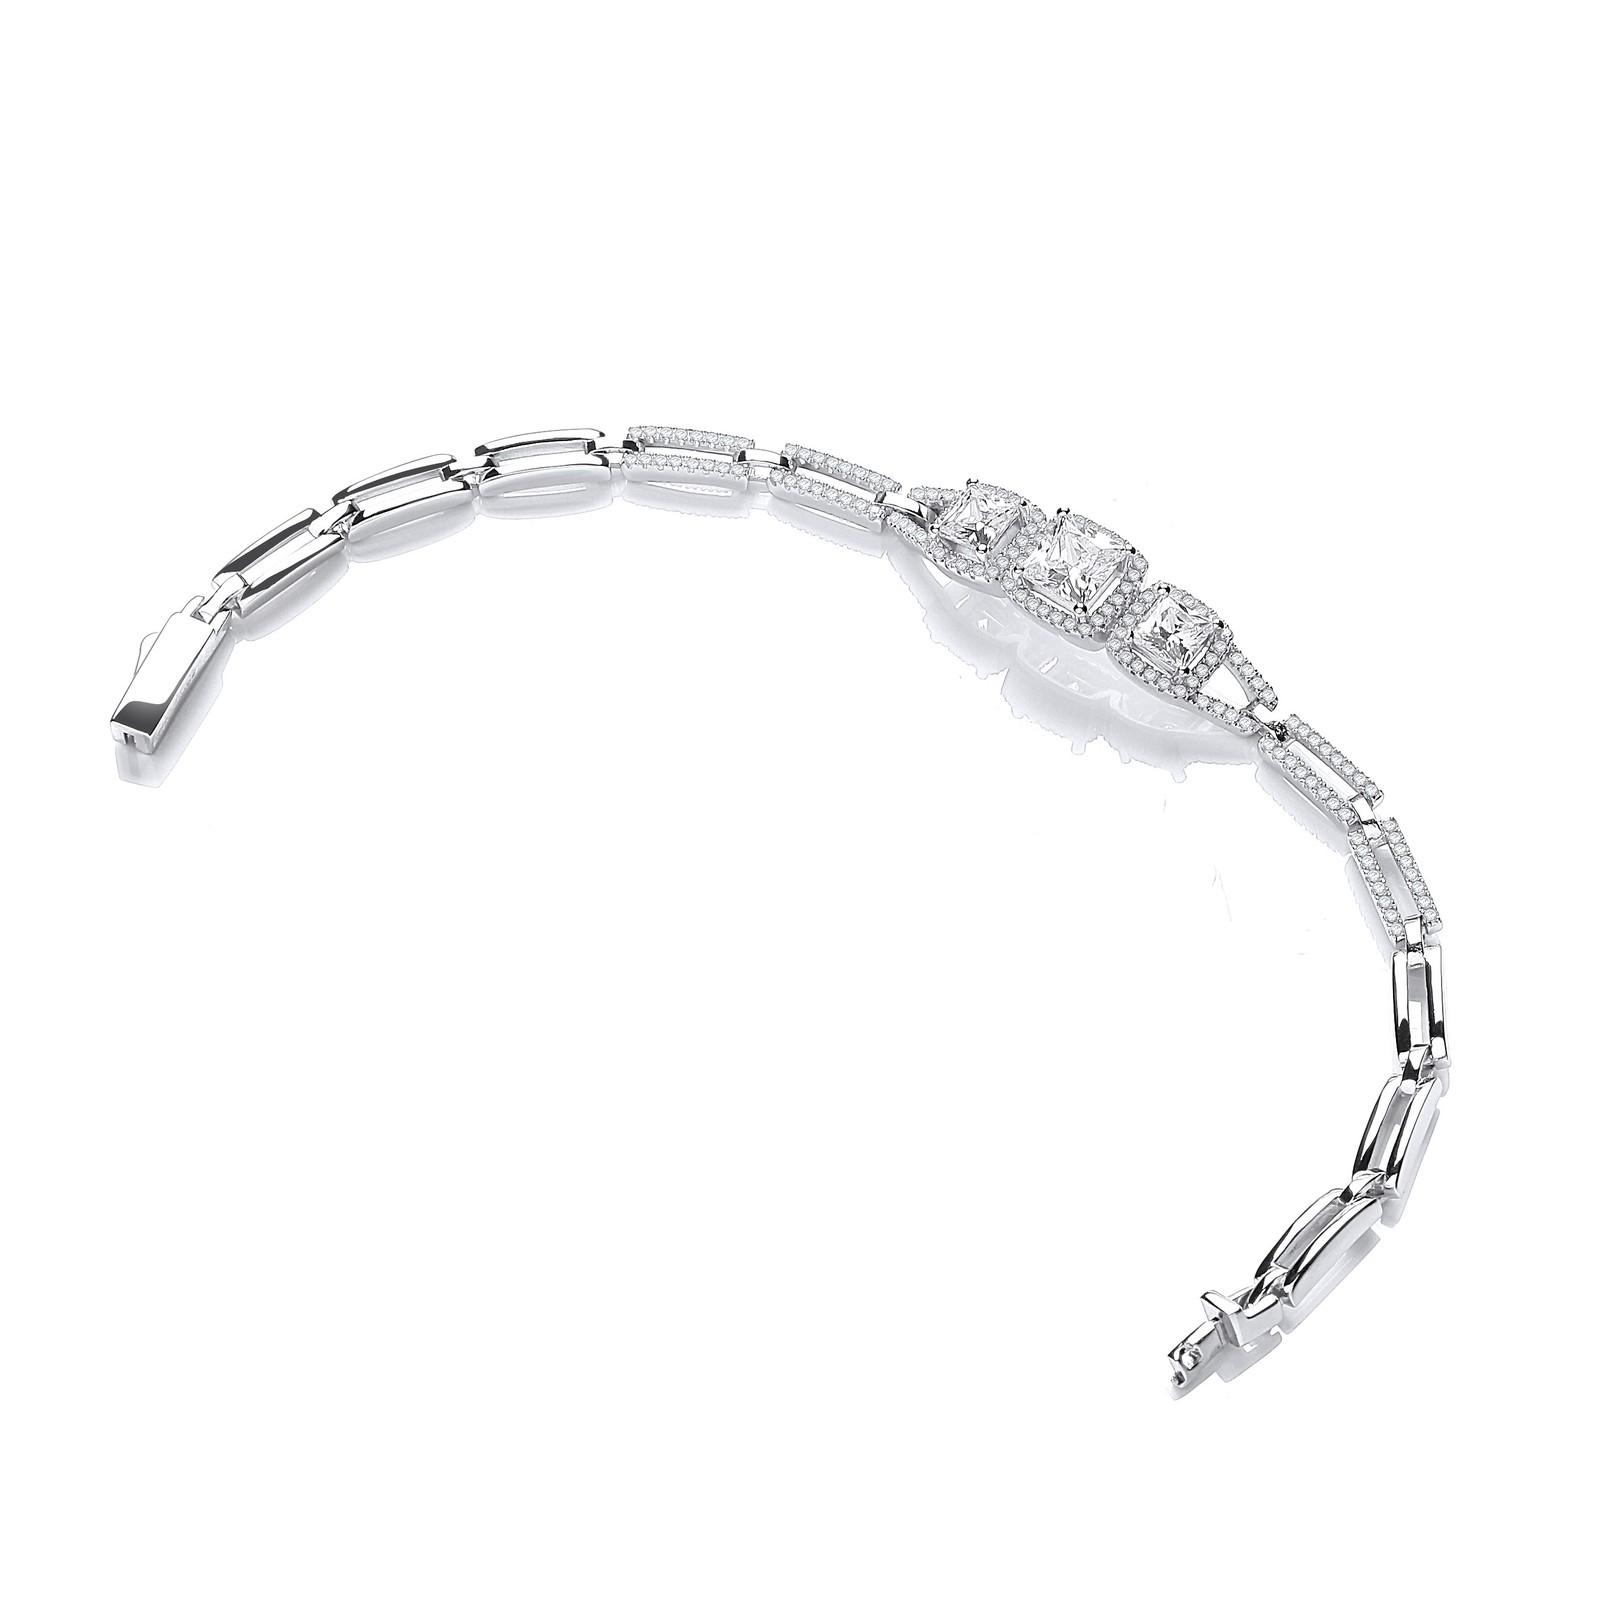 "Micro Pave' Trilogy Princess Cut Cz's 7""/19cm Bracelet"